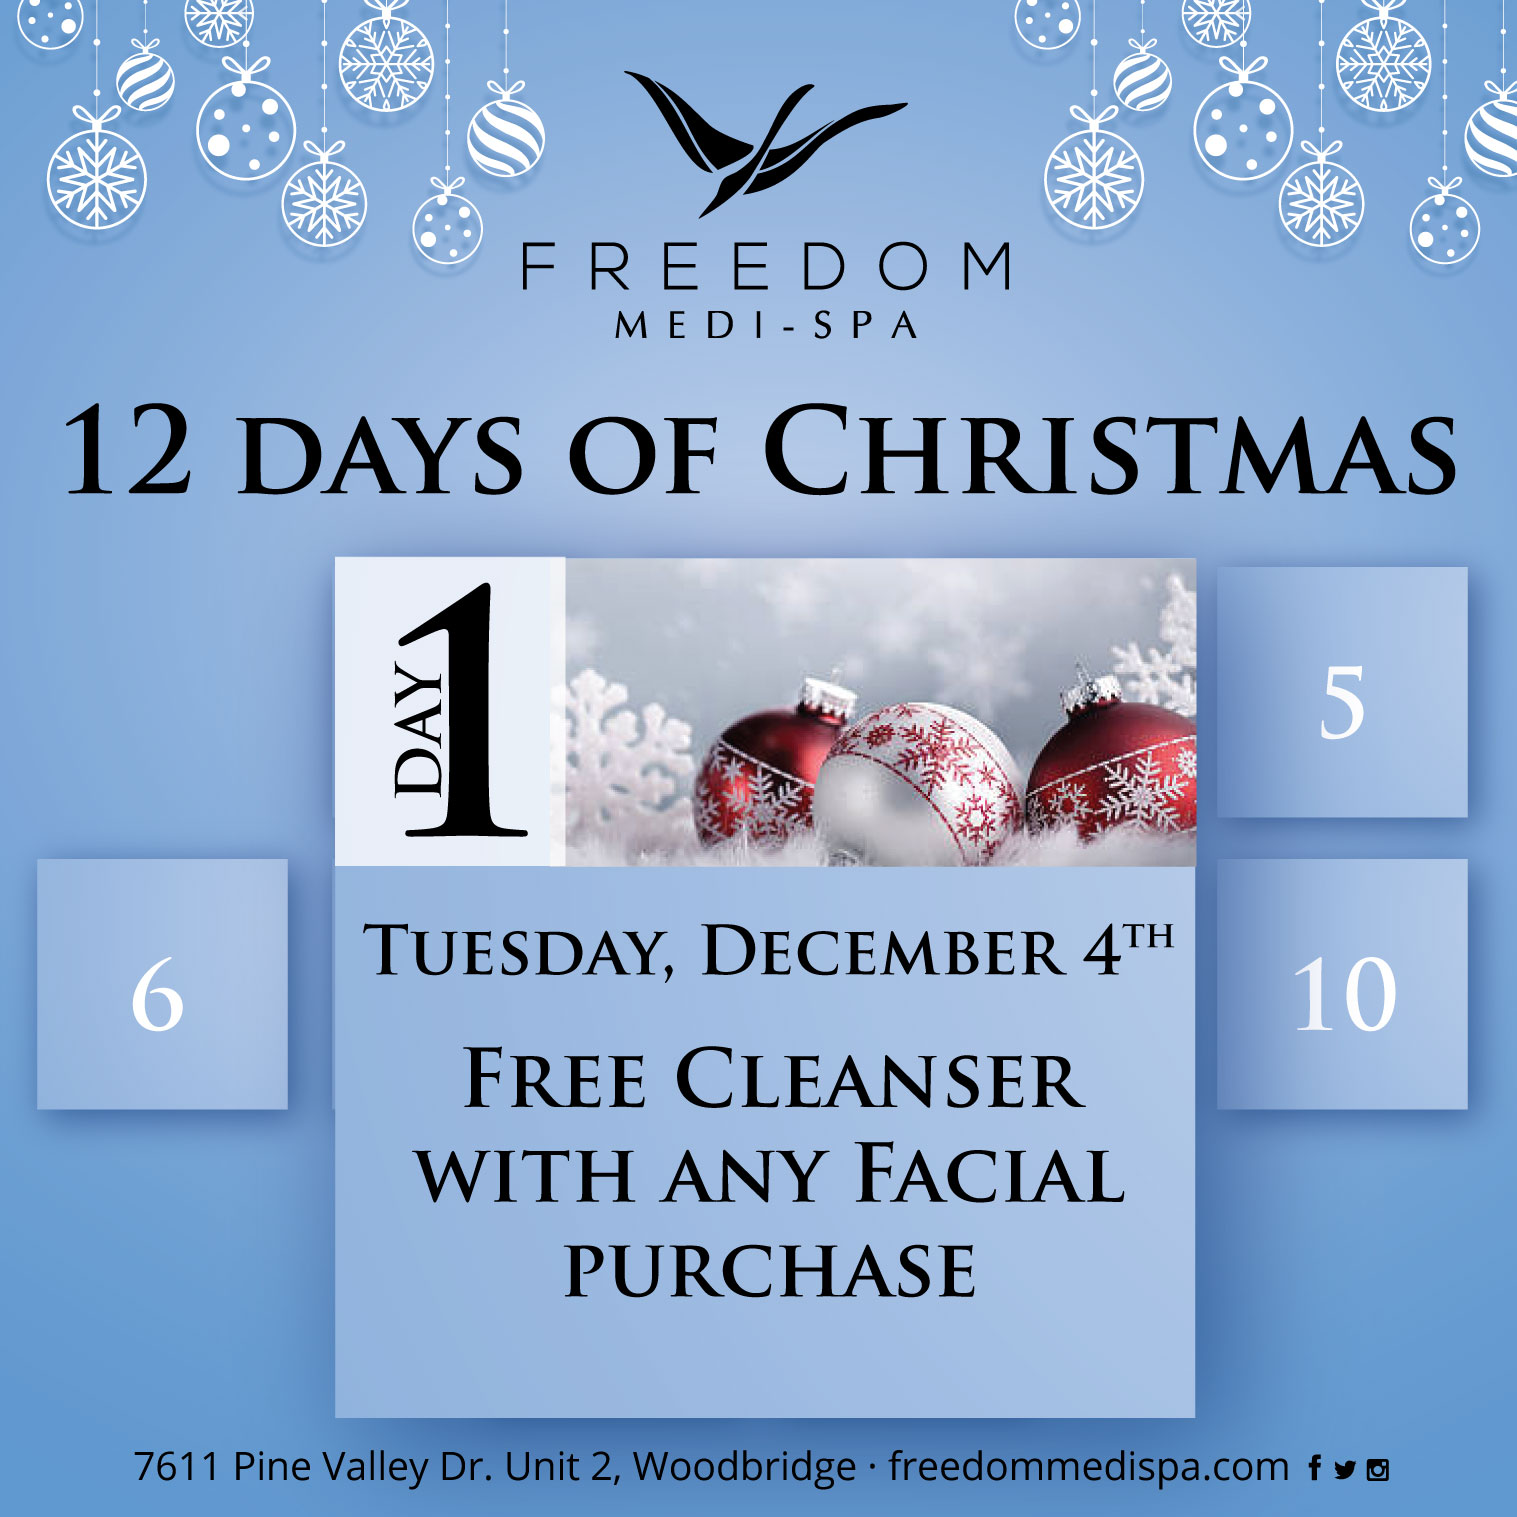 Freedom-12days-promo-day1.jpg